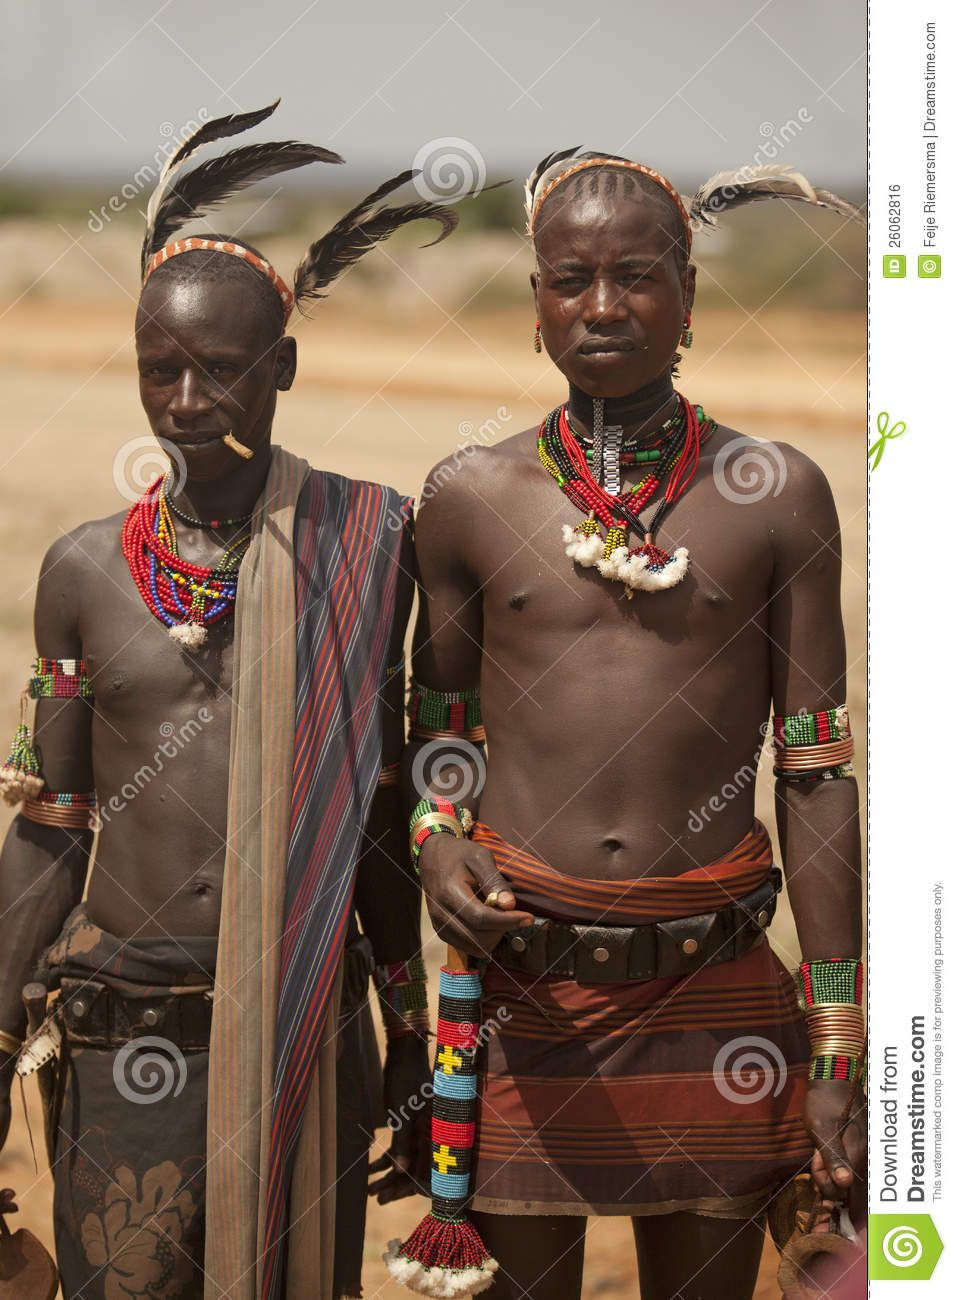 African Tribal Men Editorial Photo - Image 26062816 -3814